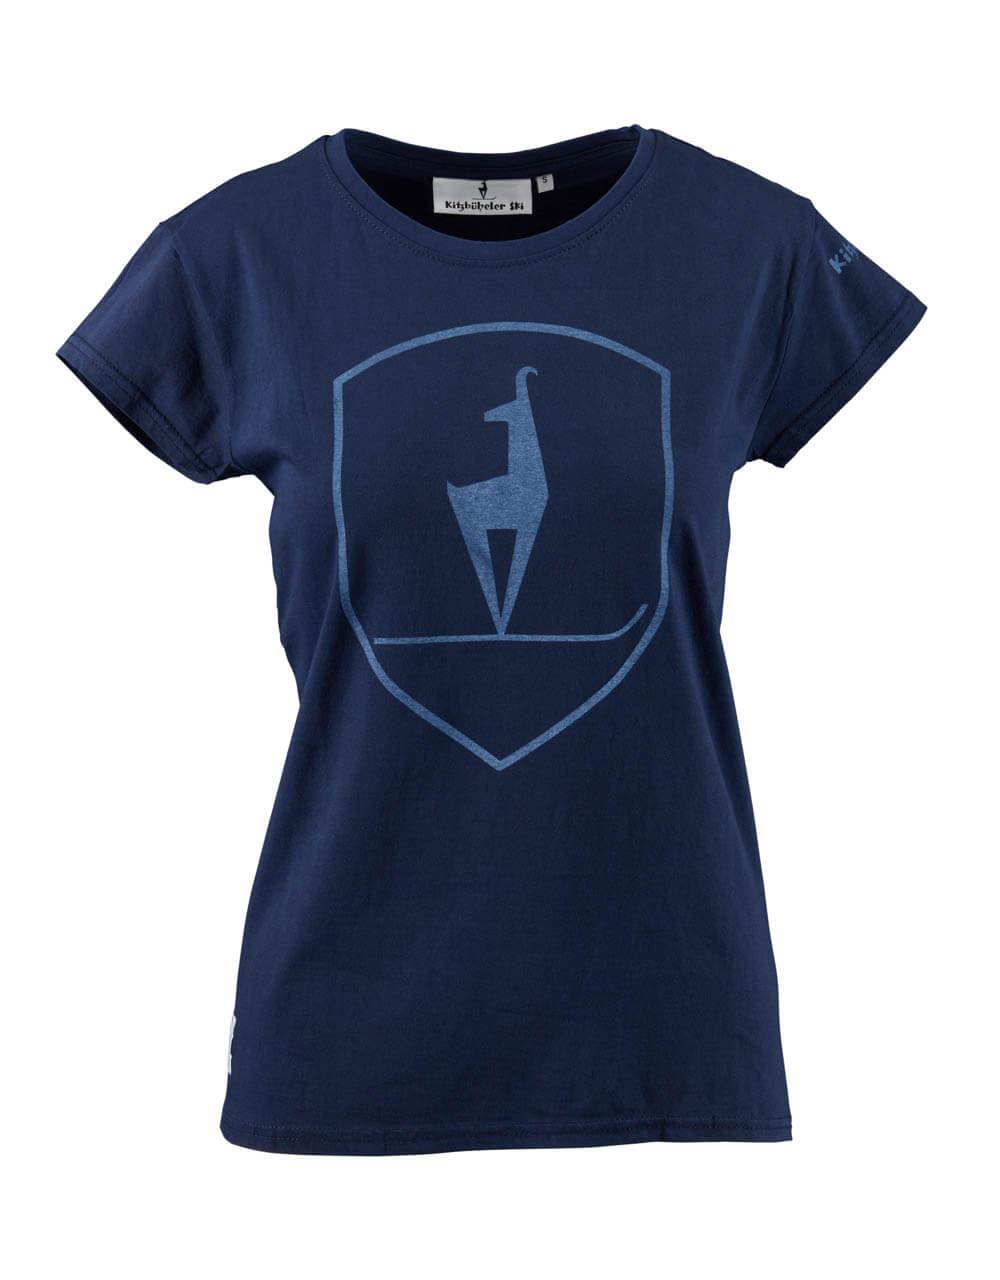 681705046 Damen T-Shirt indigo